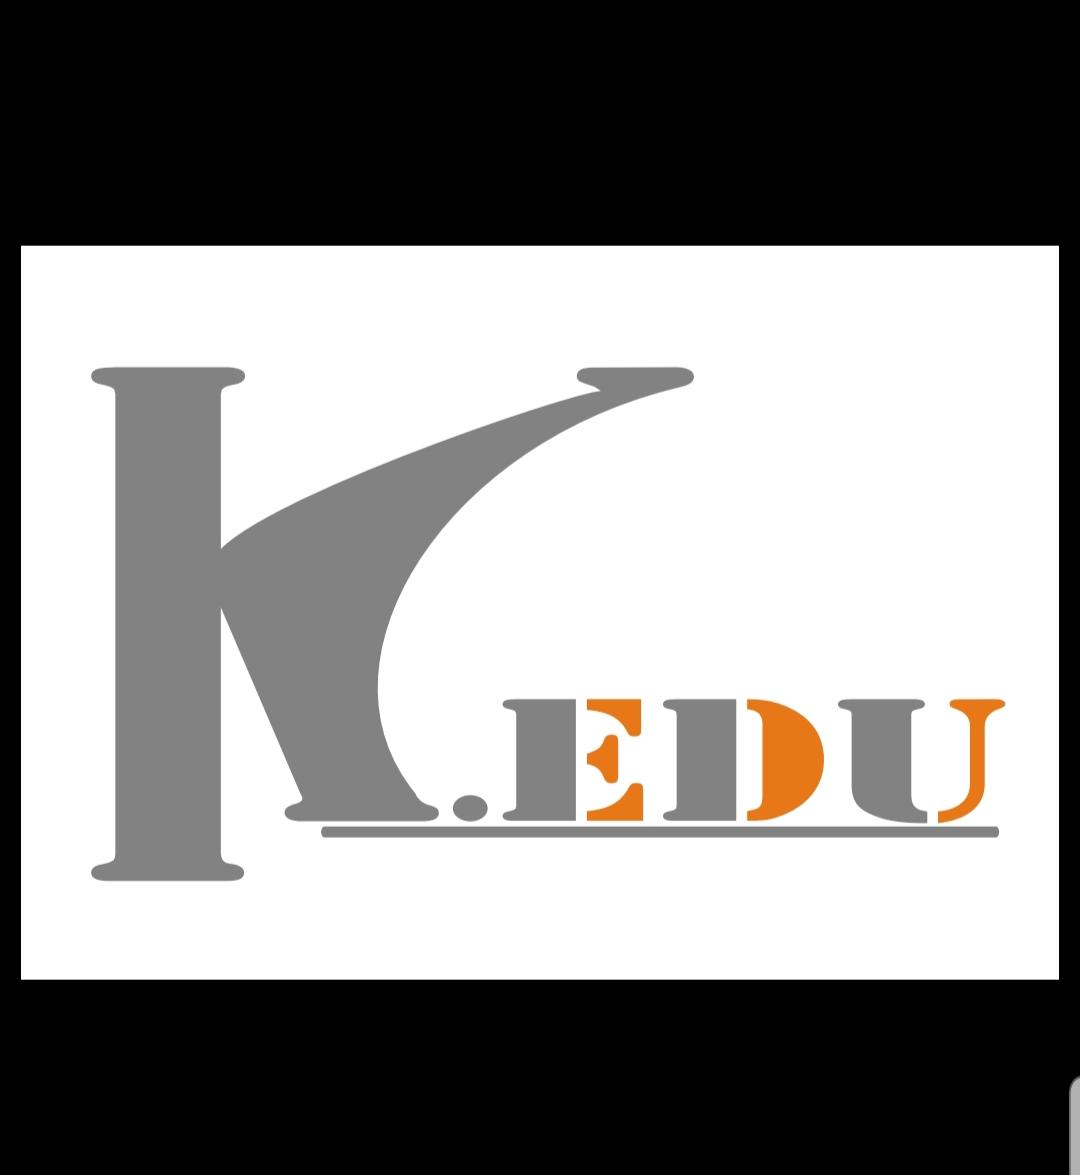 Restaurante K Edu